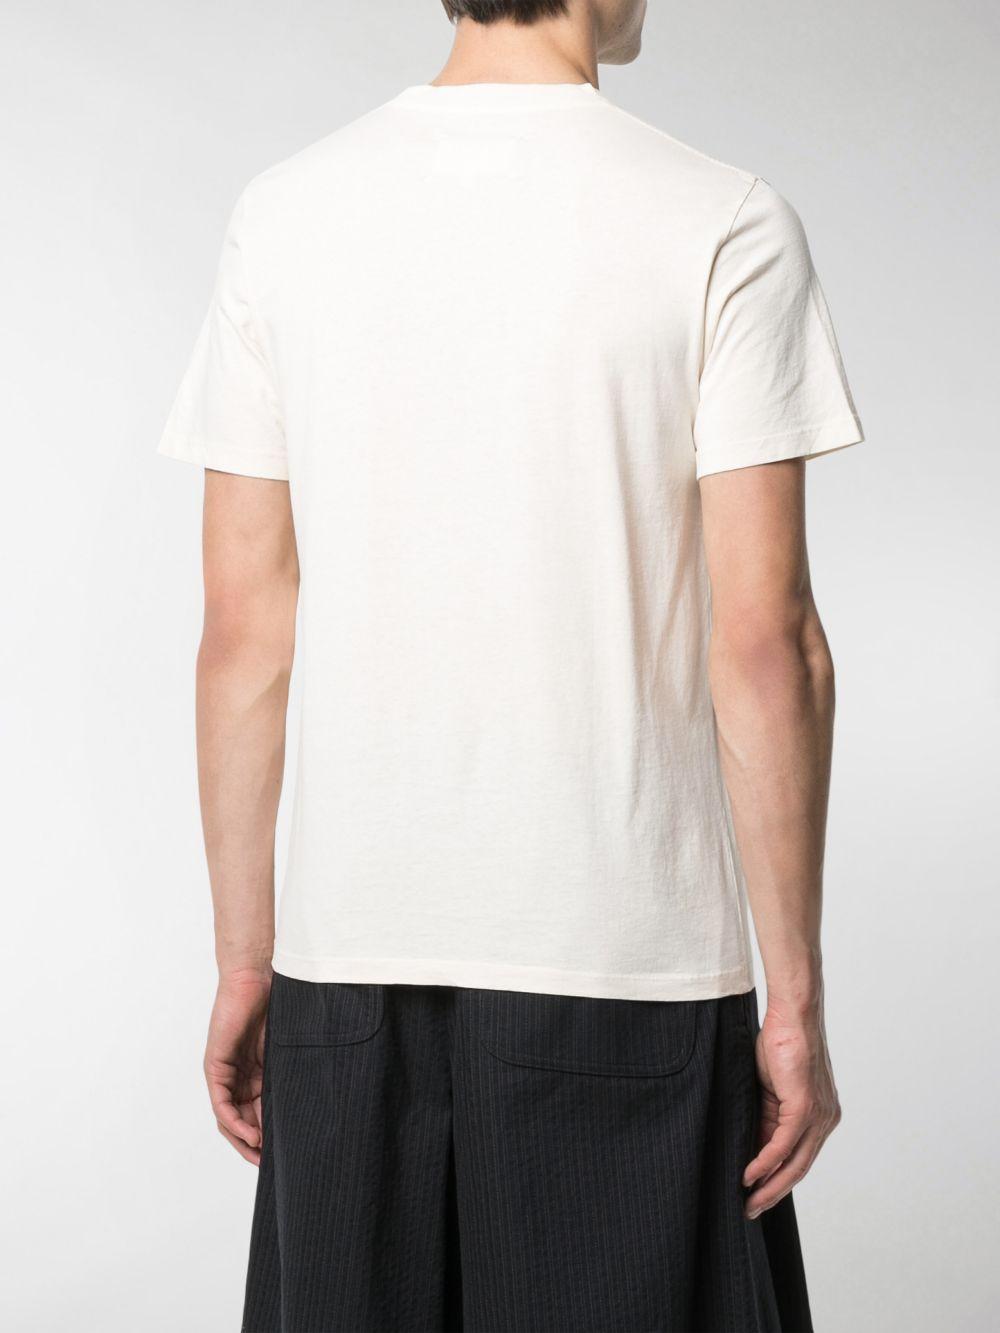 TRIPACK T-SHIRT MAISON MARGIELA   T-shirts   S50GC0650 S23909961